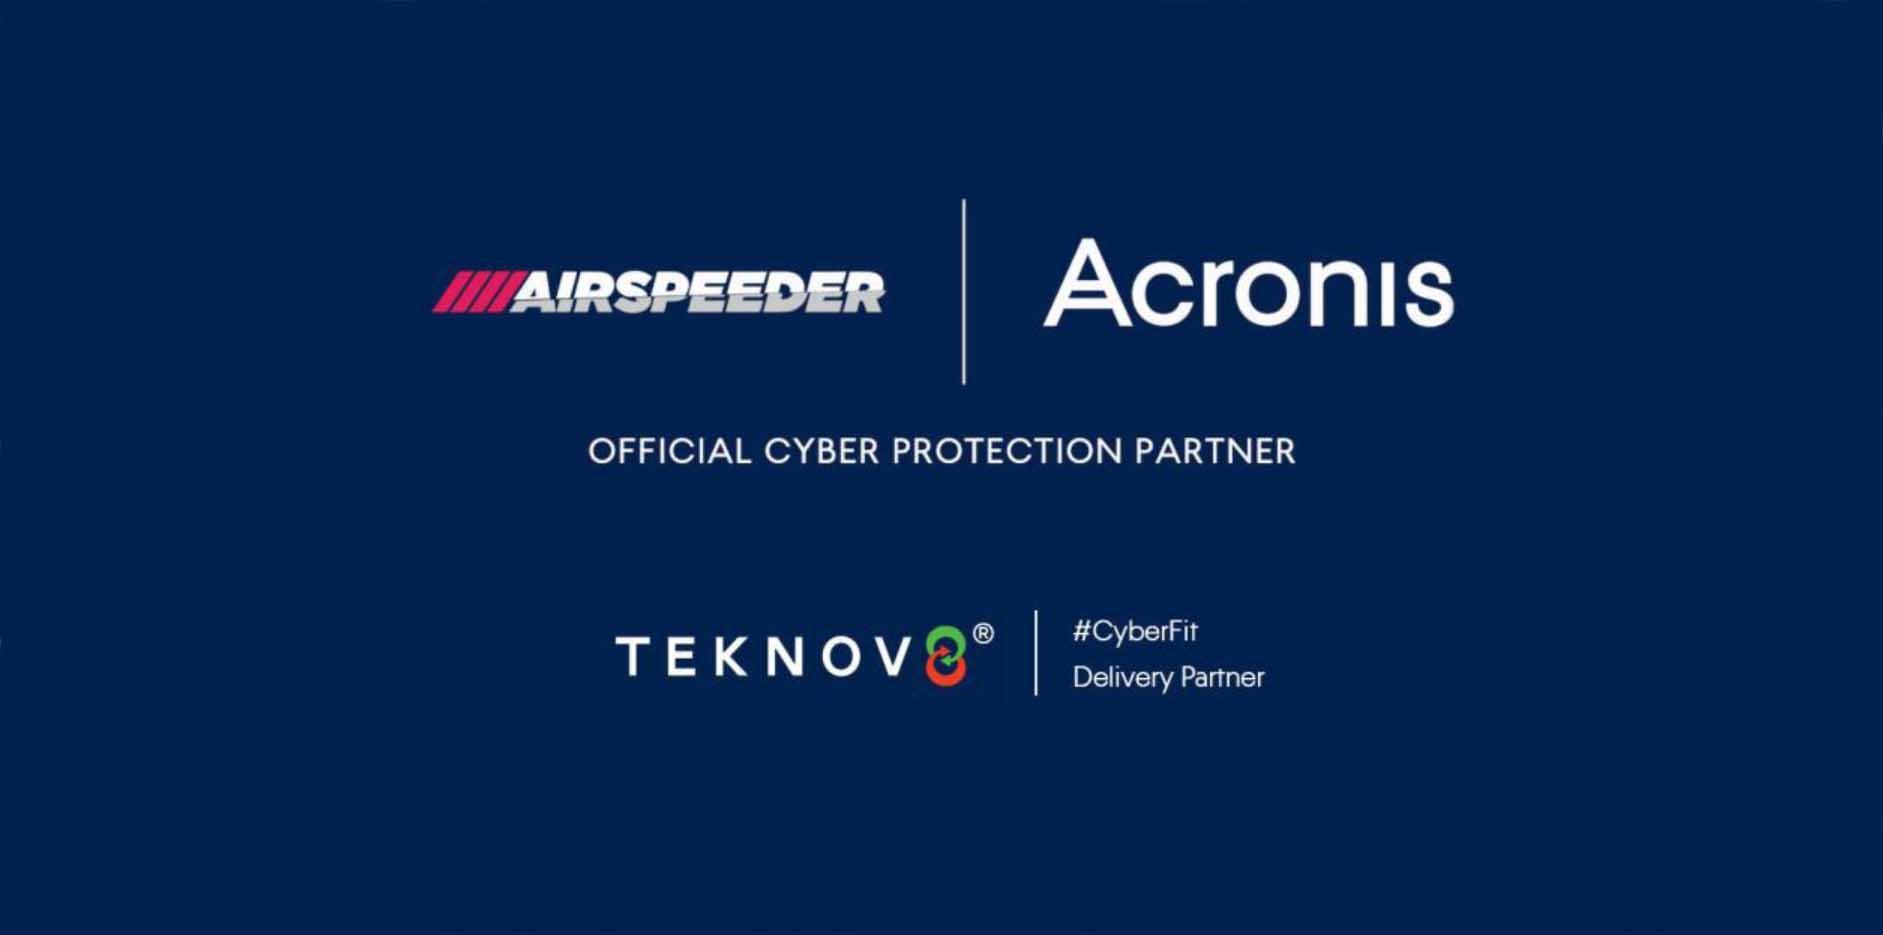 Airspeeder Acronis Teknov